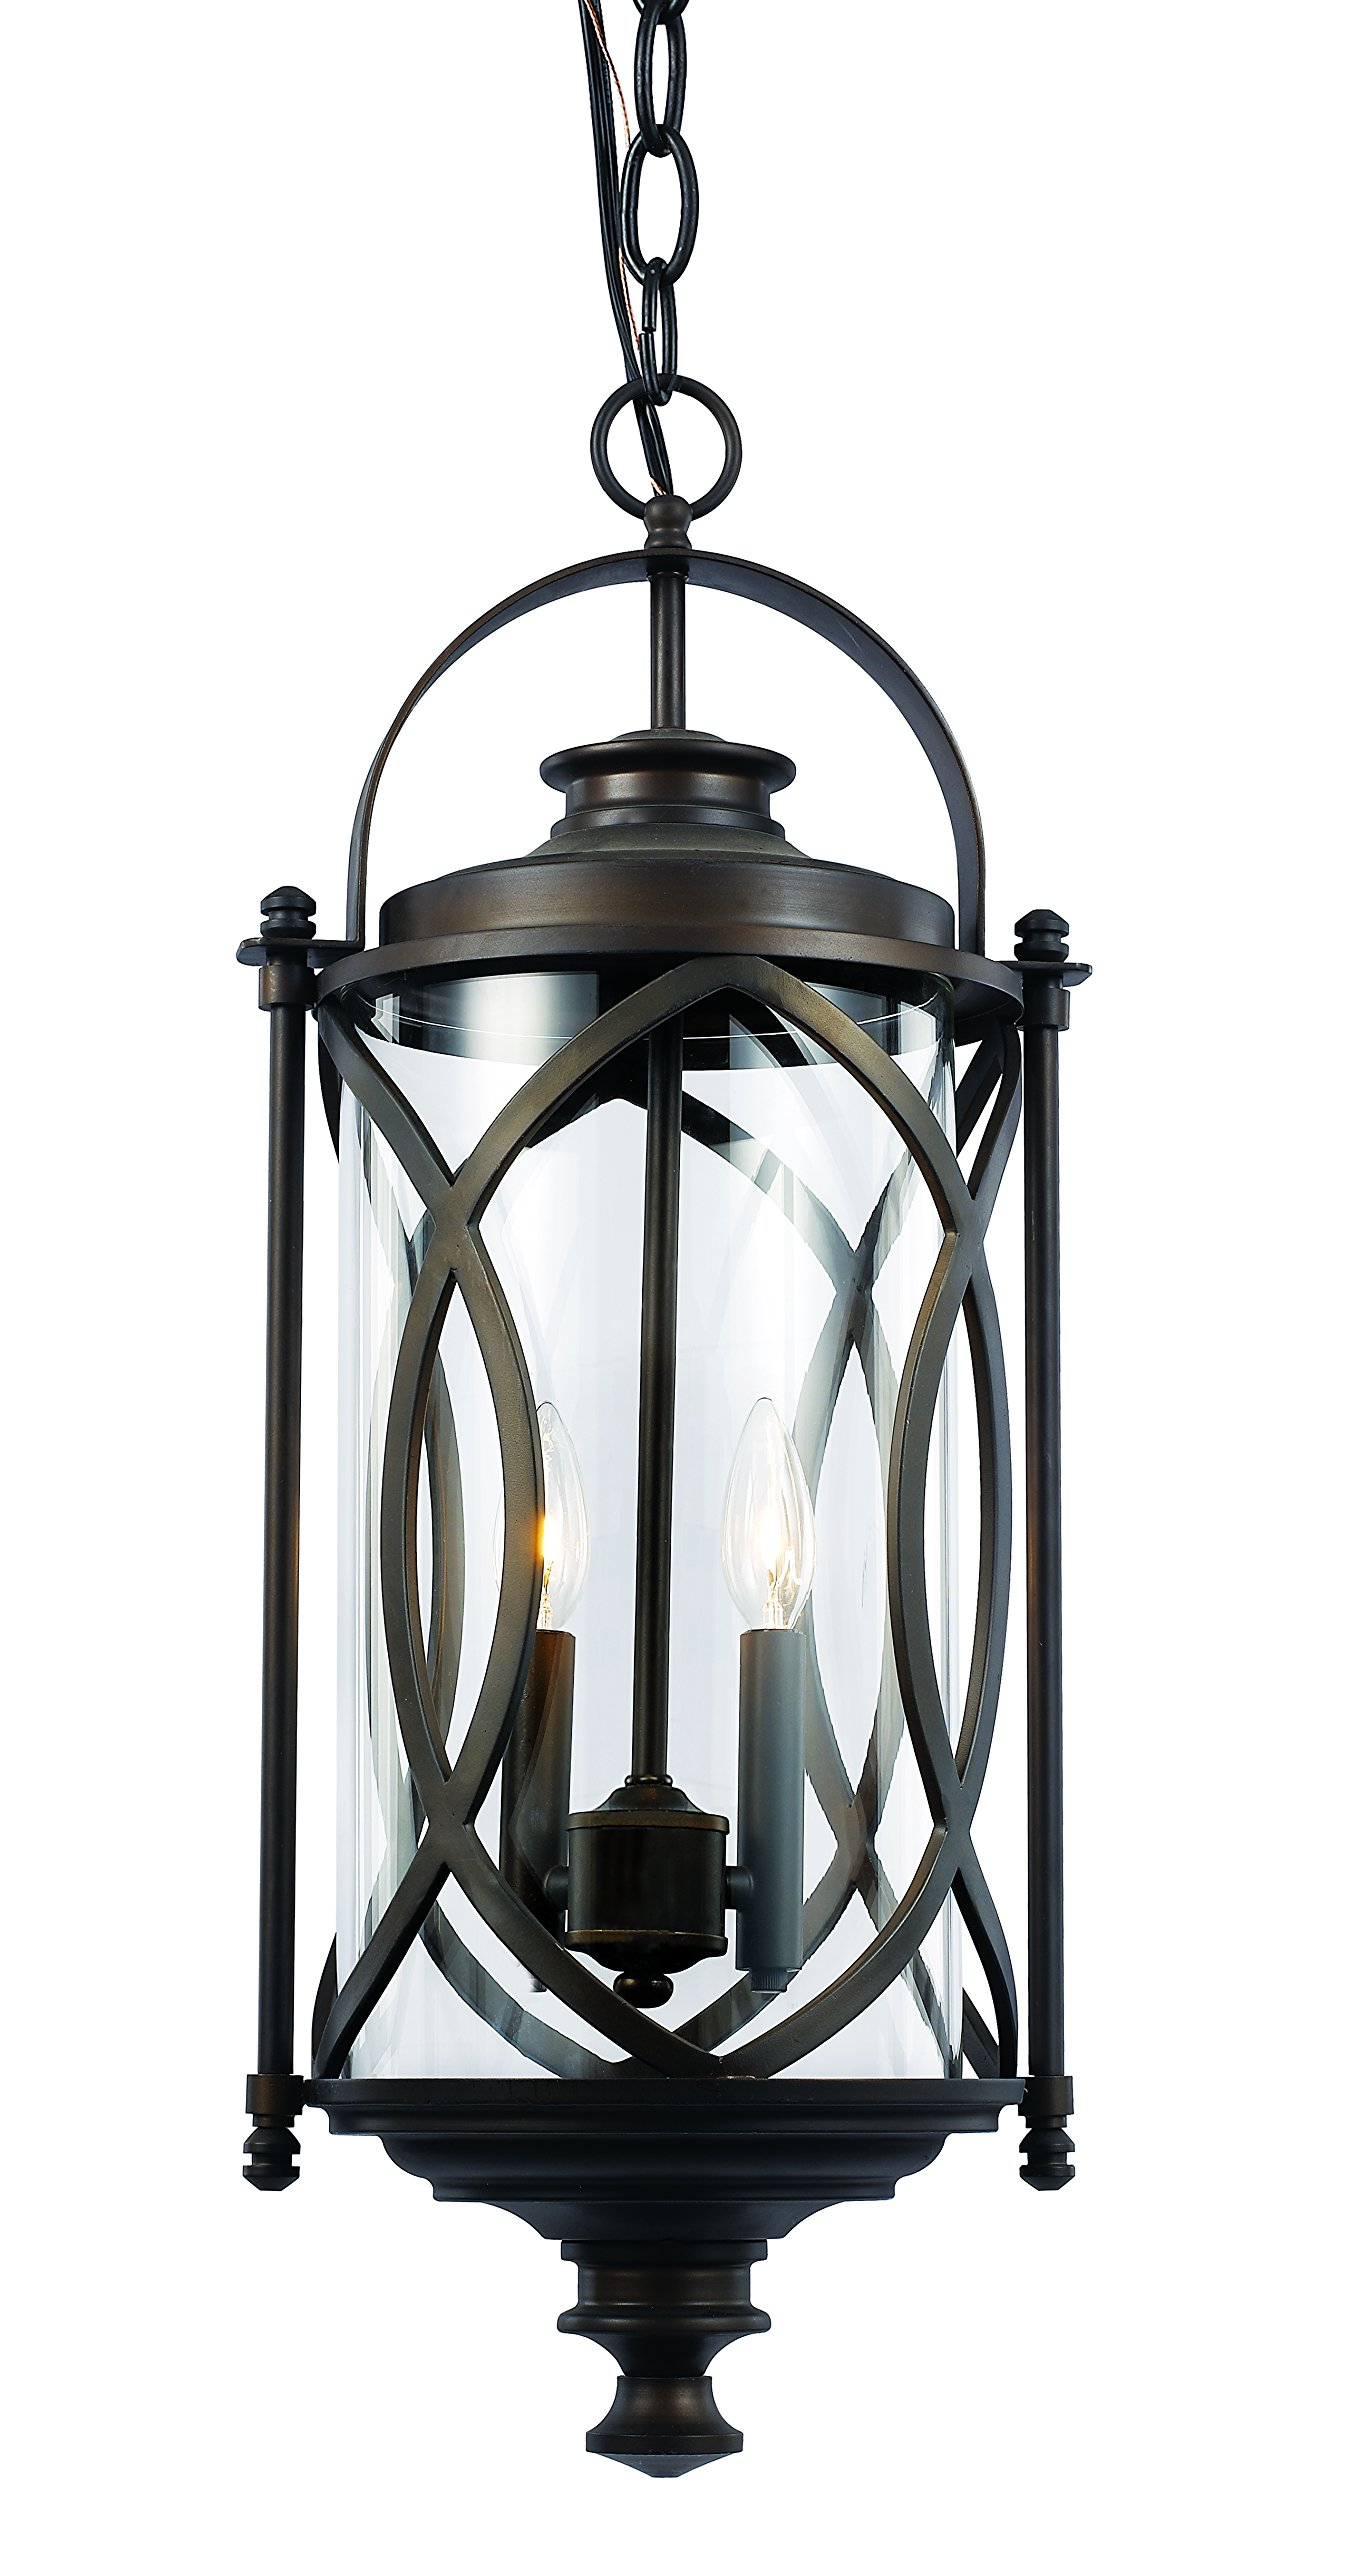 Trans Globe Lighting 40413 ROB Outdoor Fiesta 24'' Hanging Lantern, Rubbed Oil Bronze